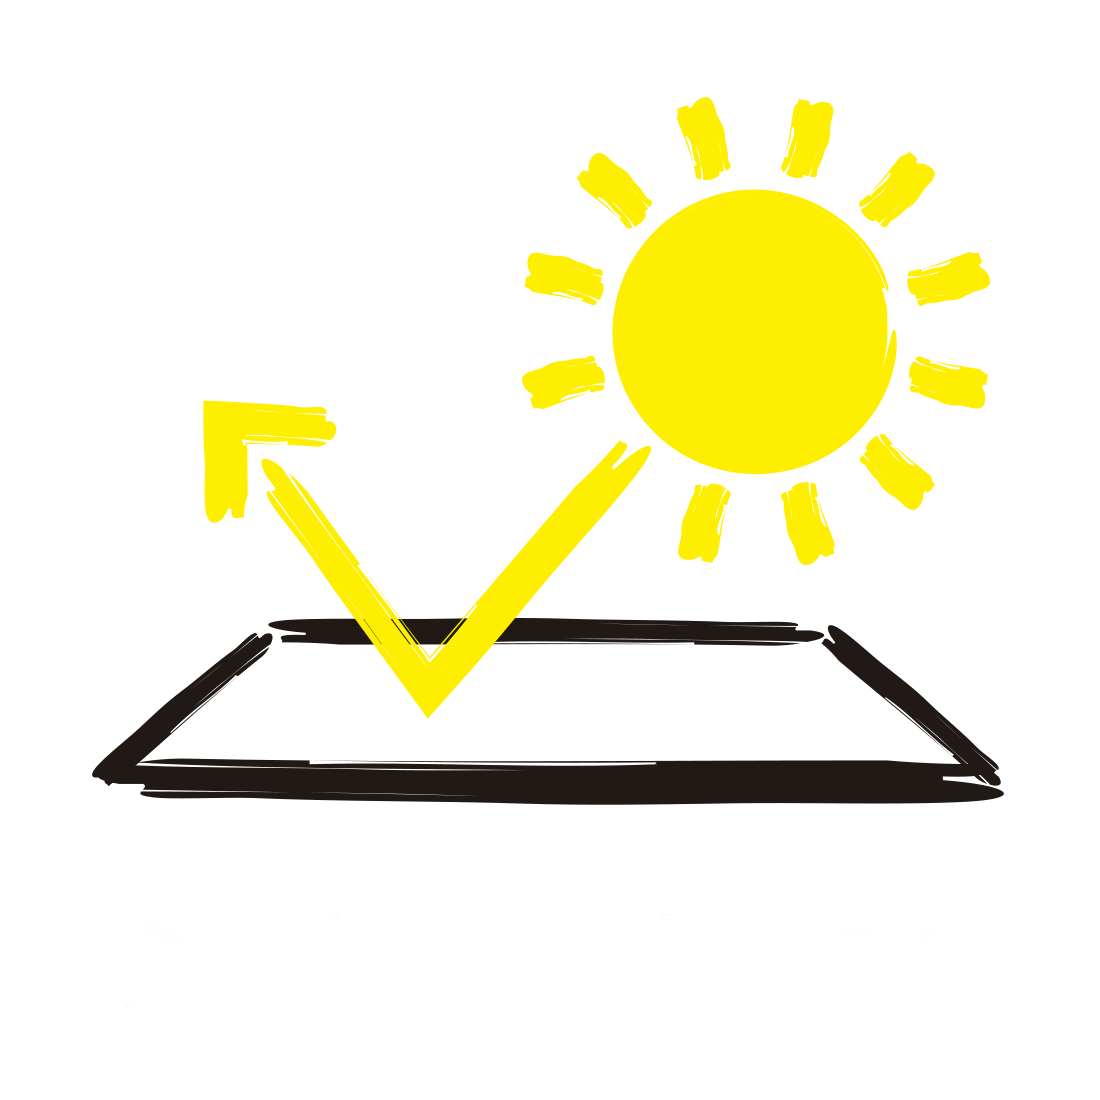 Tráfico ligero o moderado (RESISTENCIA UV)